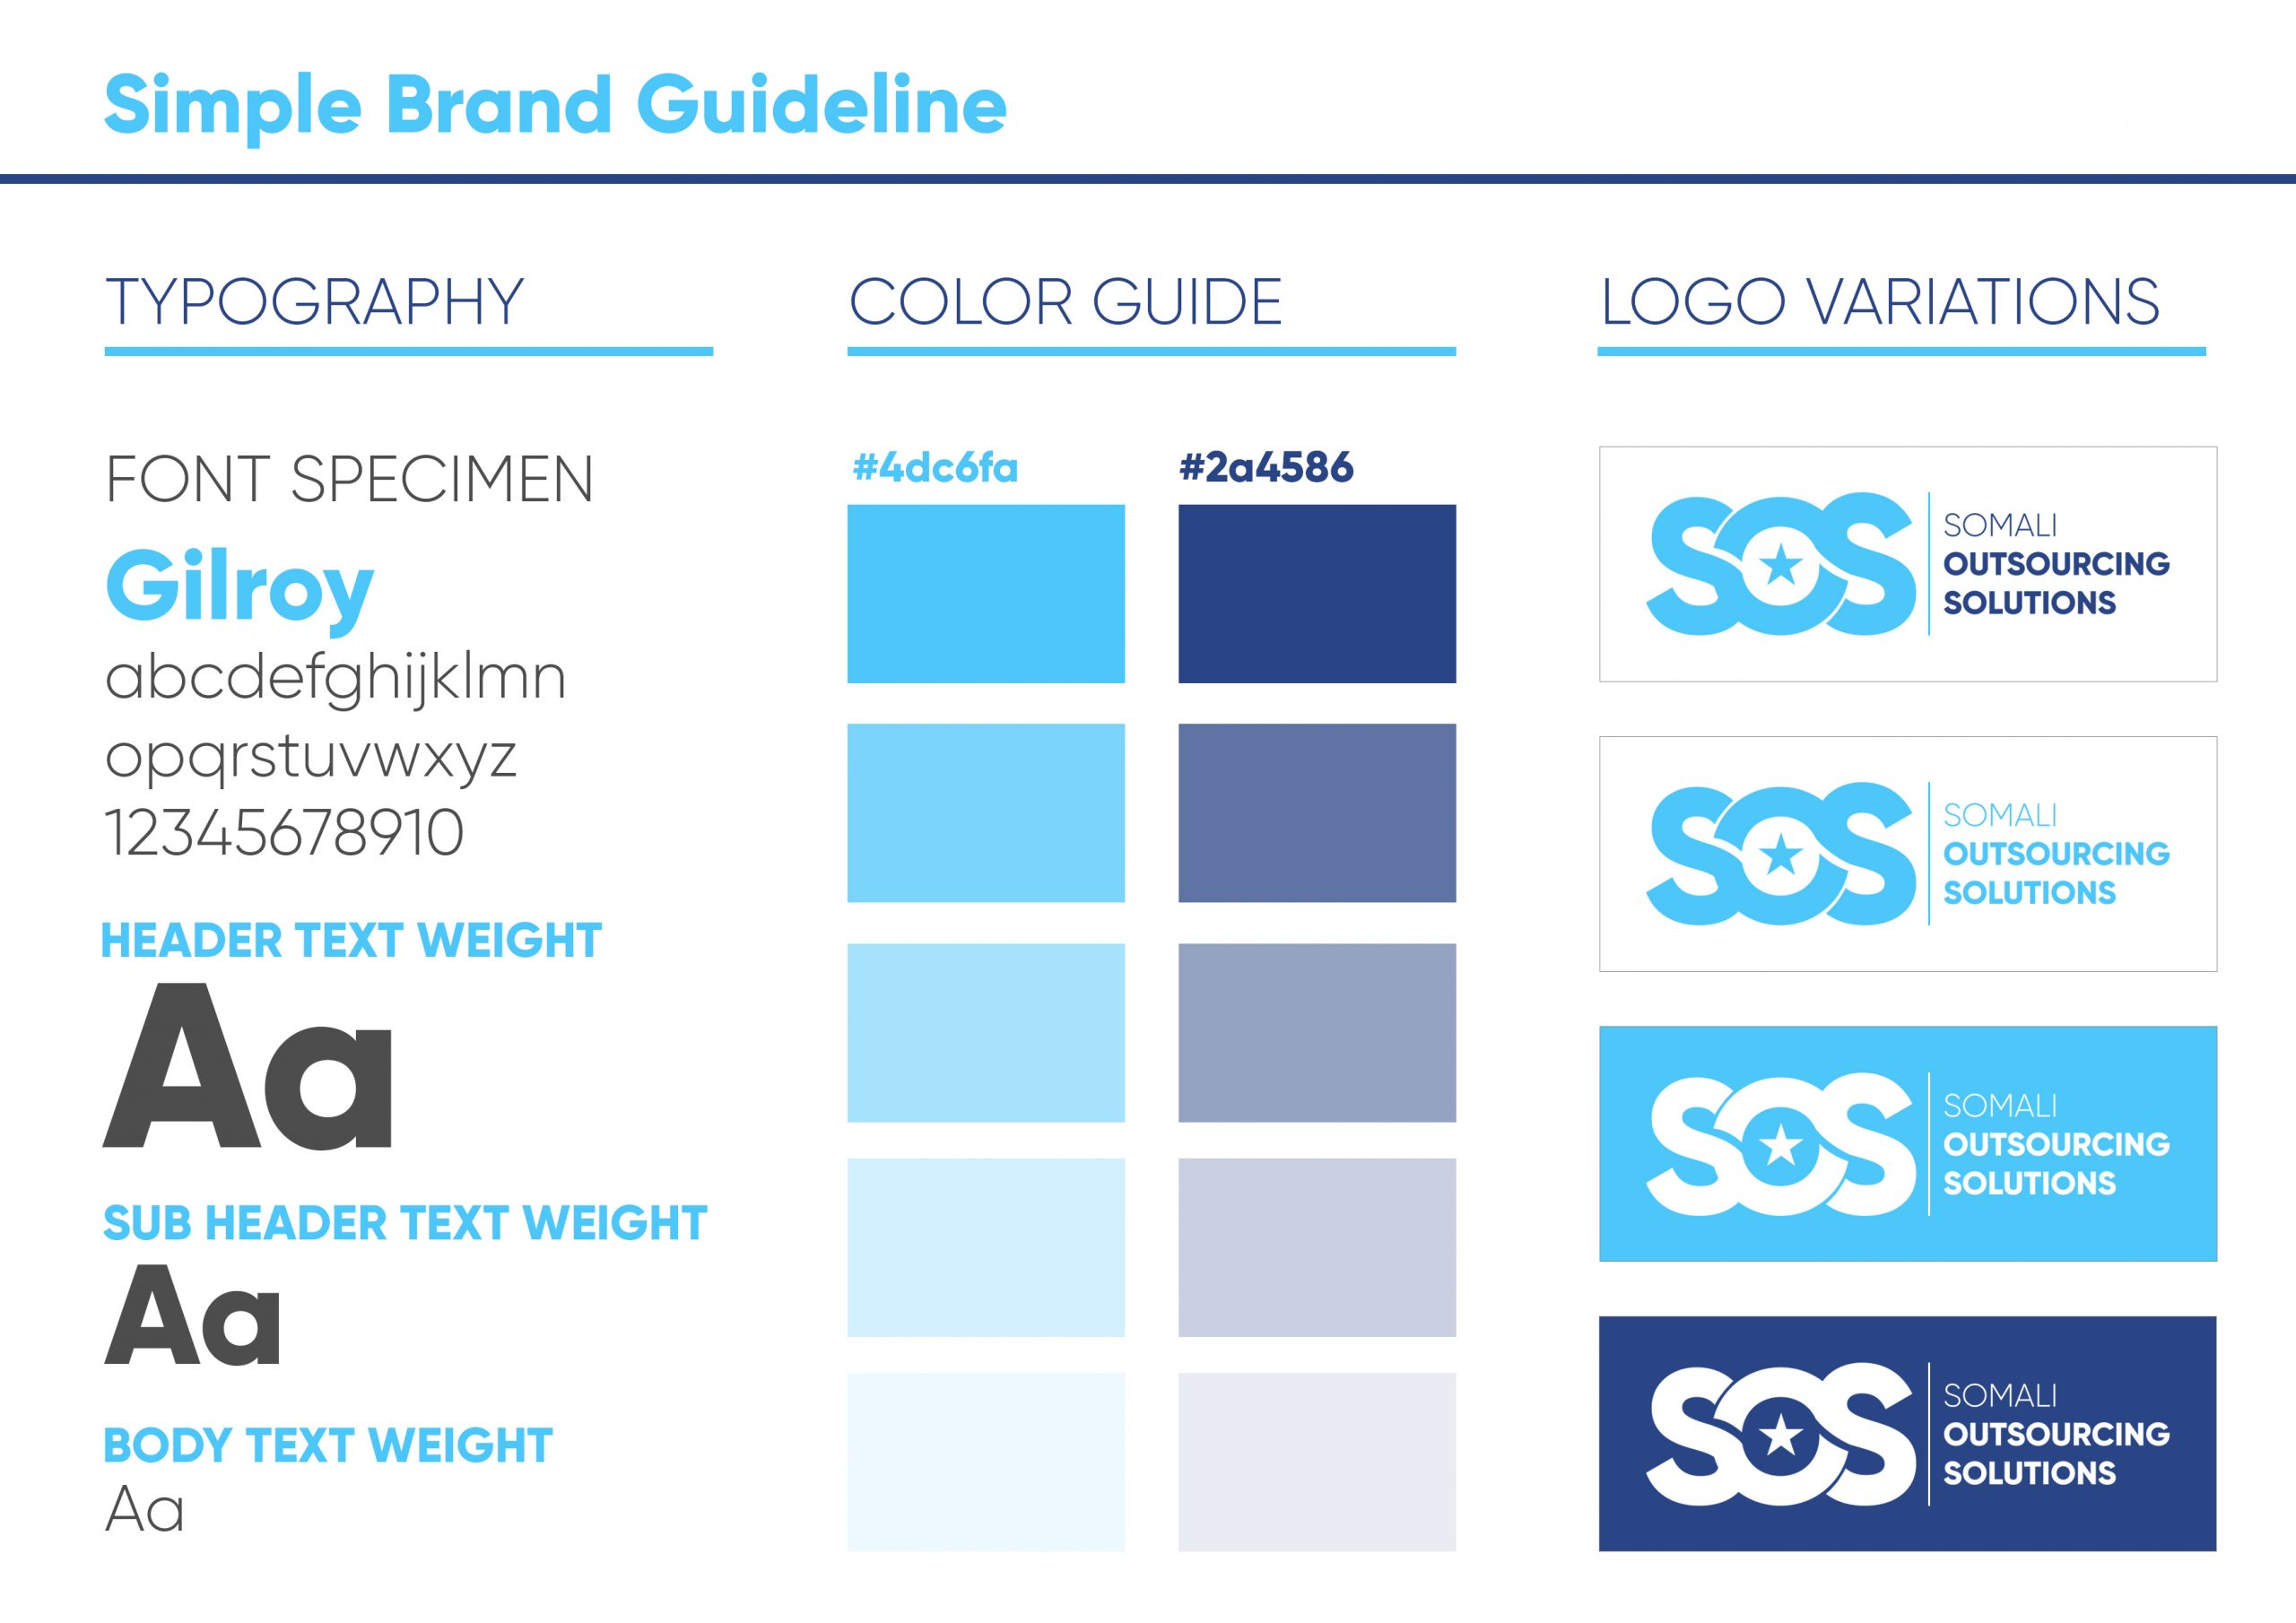 SOS Brand